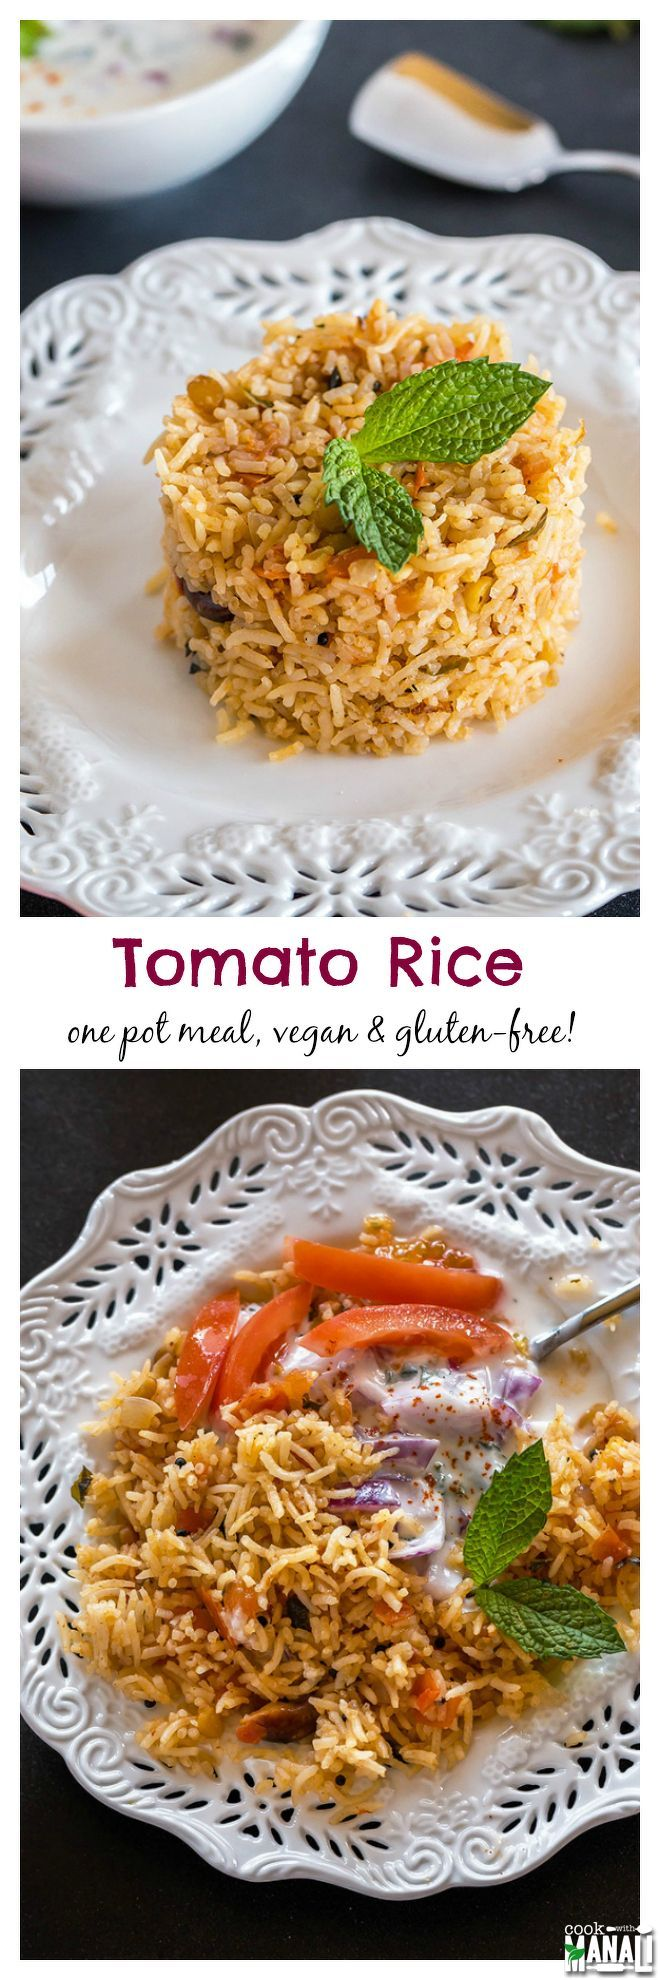 One-pot spicy Tomato Rice. This rice is best enjoyed with raita (yogurt dip) or simply plain yogurt. Vegan & gluten-free! Find the recipe on http://www.cookwithmanali.com